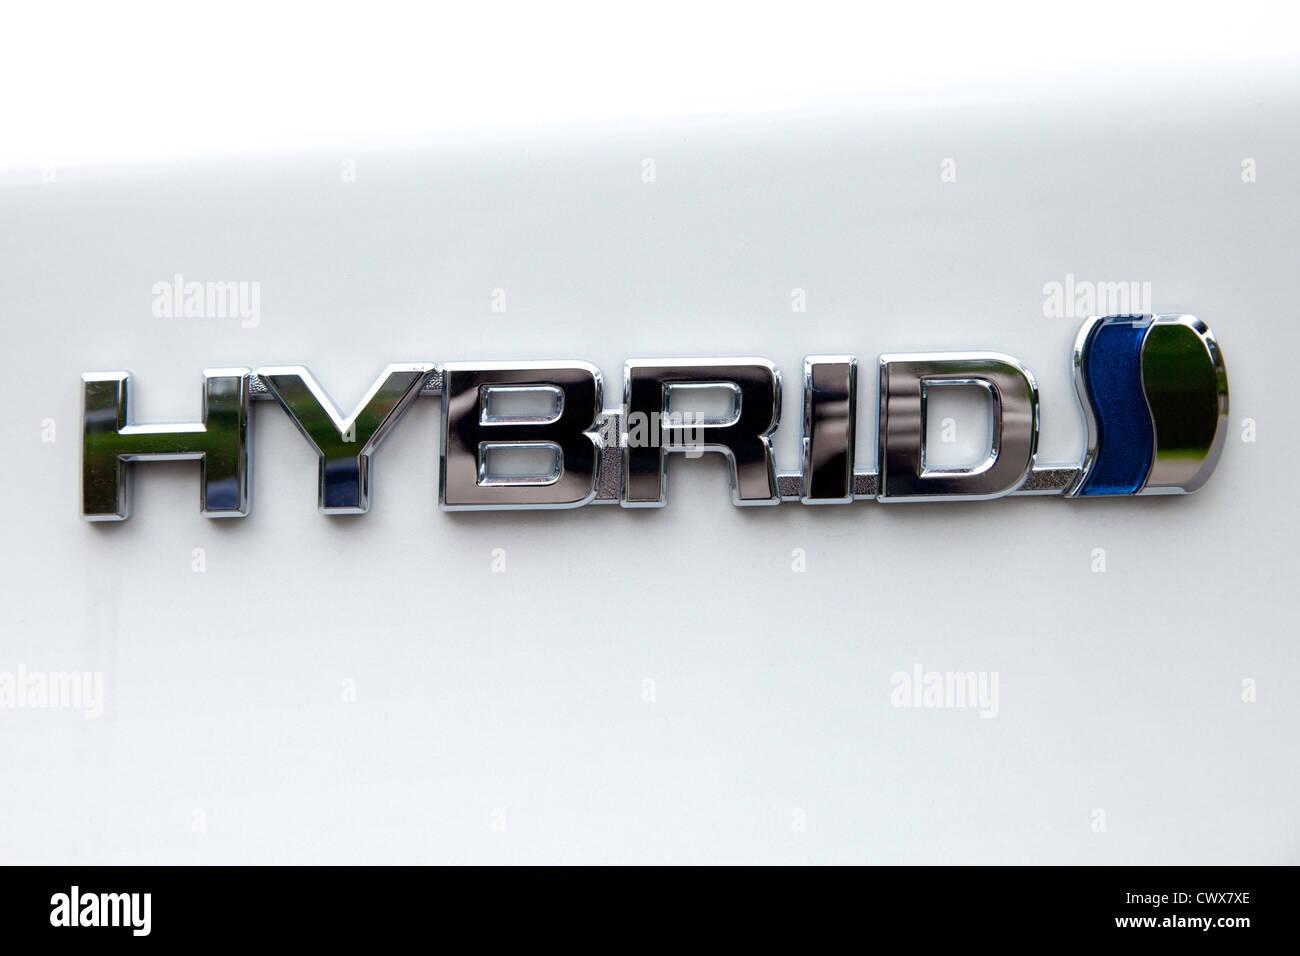 Toyota Prius Hybrid Car (2012) Logo - Stock Image